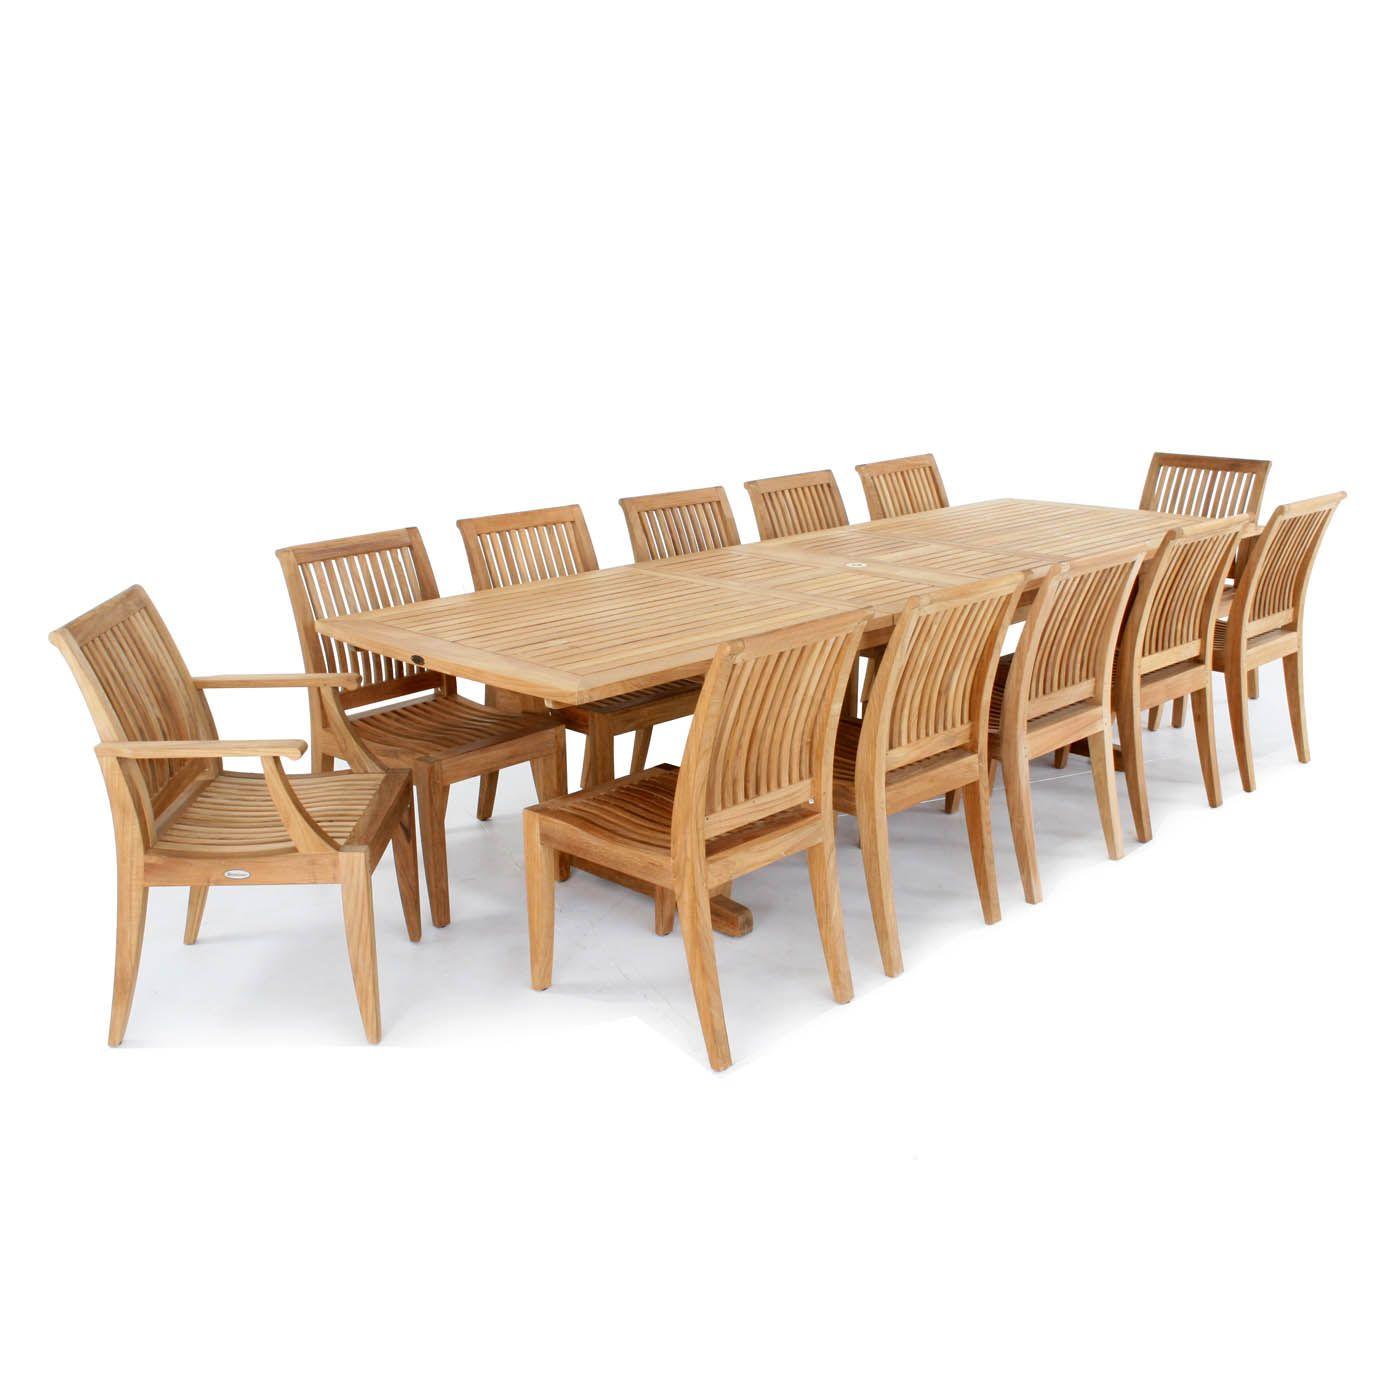 Grand Laguna 13 Pc Teak Dining Set Westminster Teak Teak Furniture Set Teak Outdoor Furniture Teak Furniture